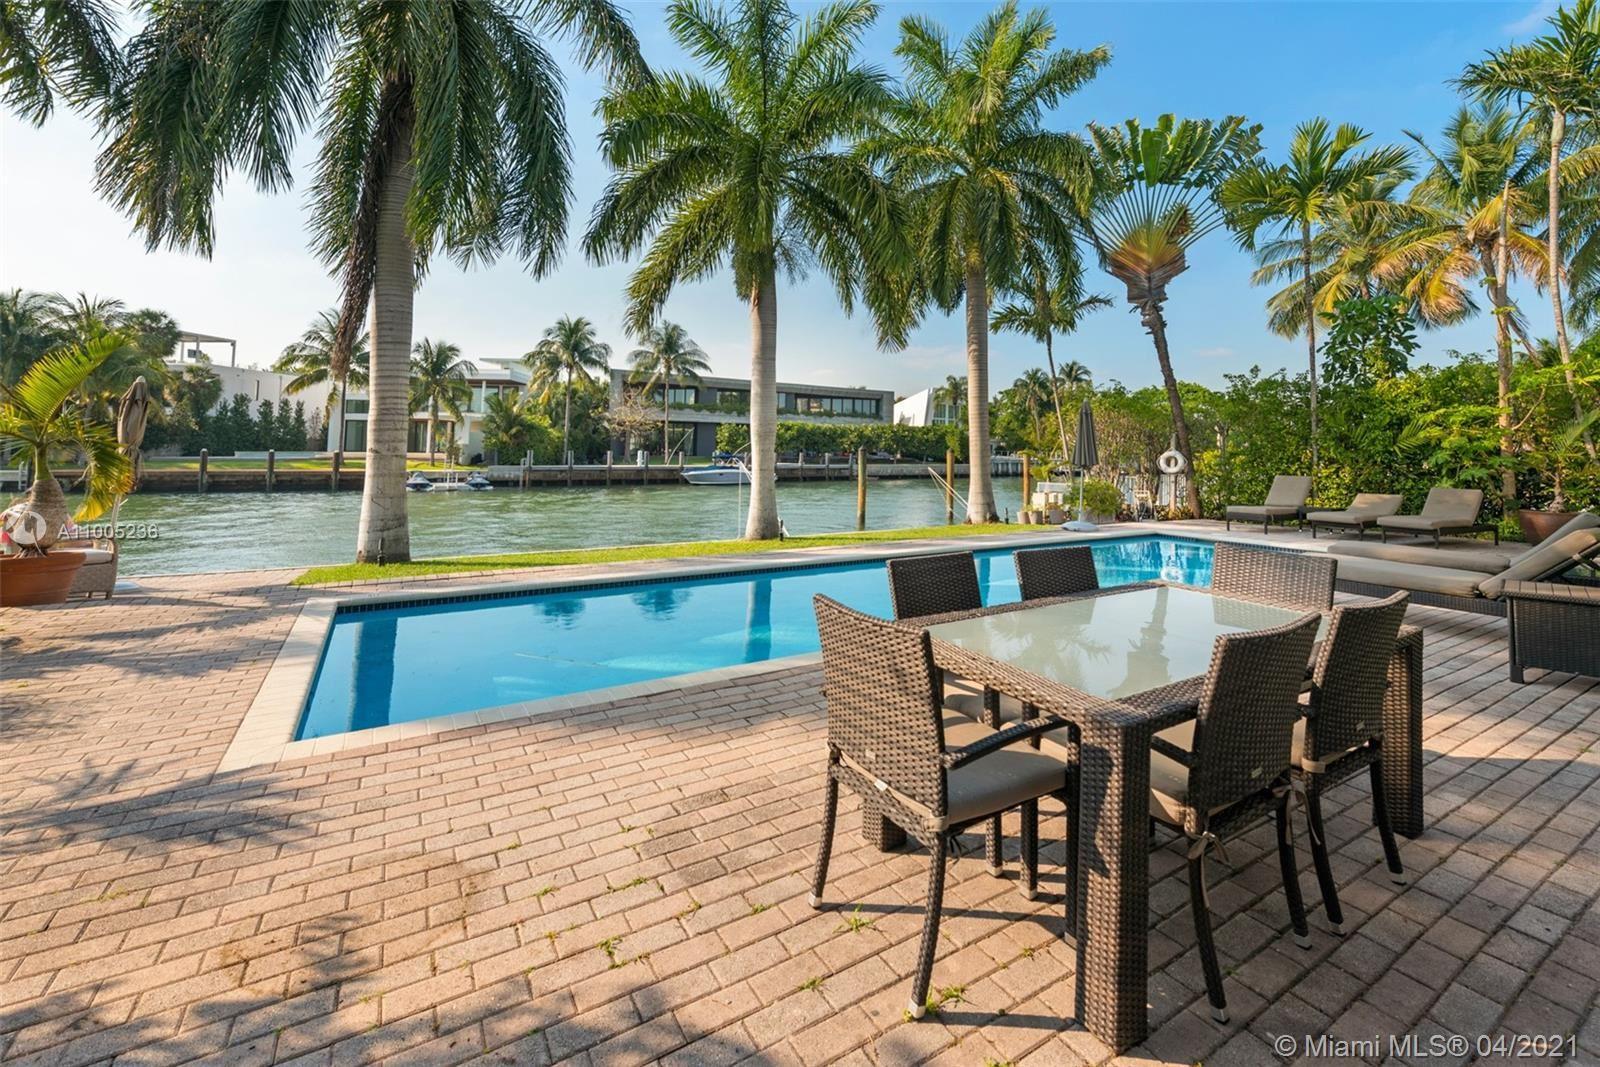 4780 Pine Tree Dr #9, Miami Beach, FL 33140 - #: A11005236